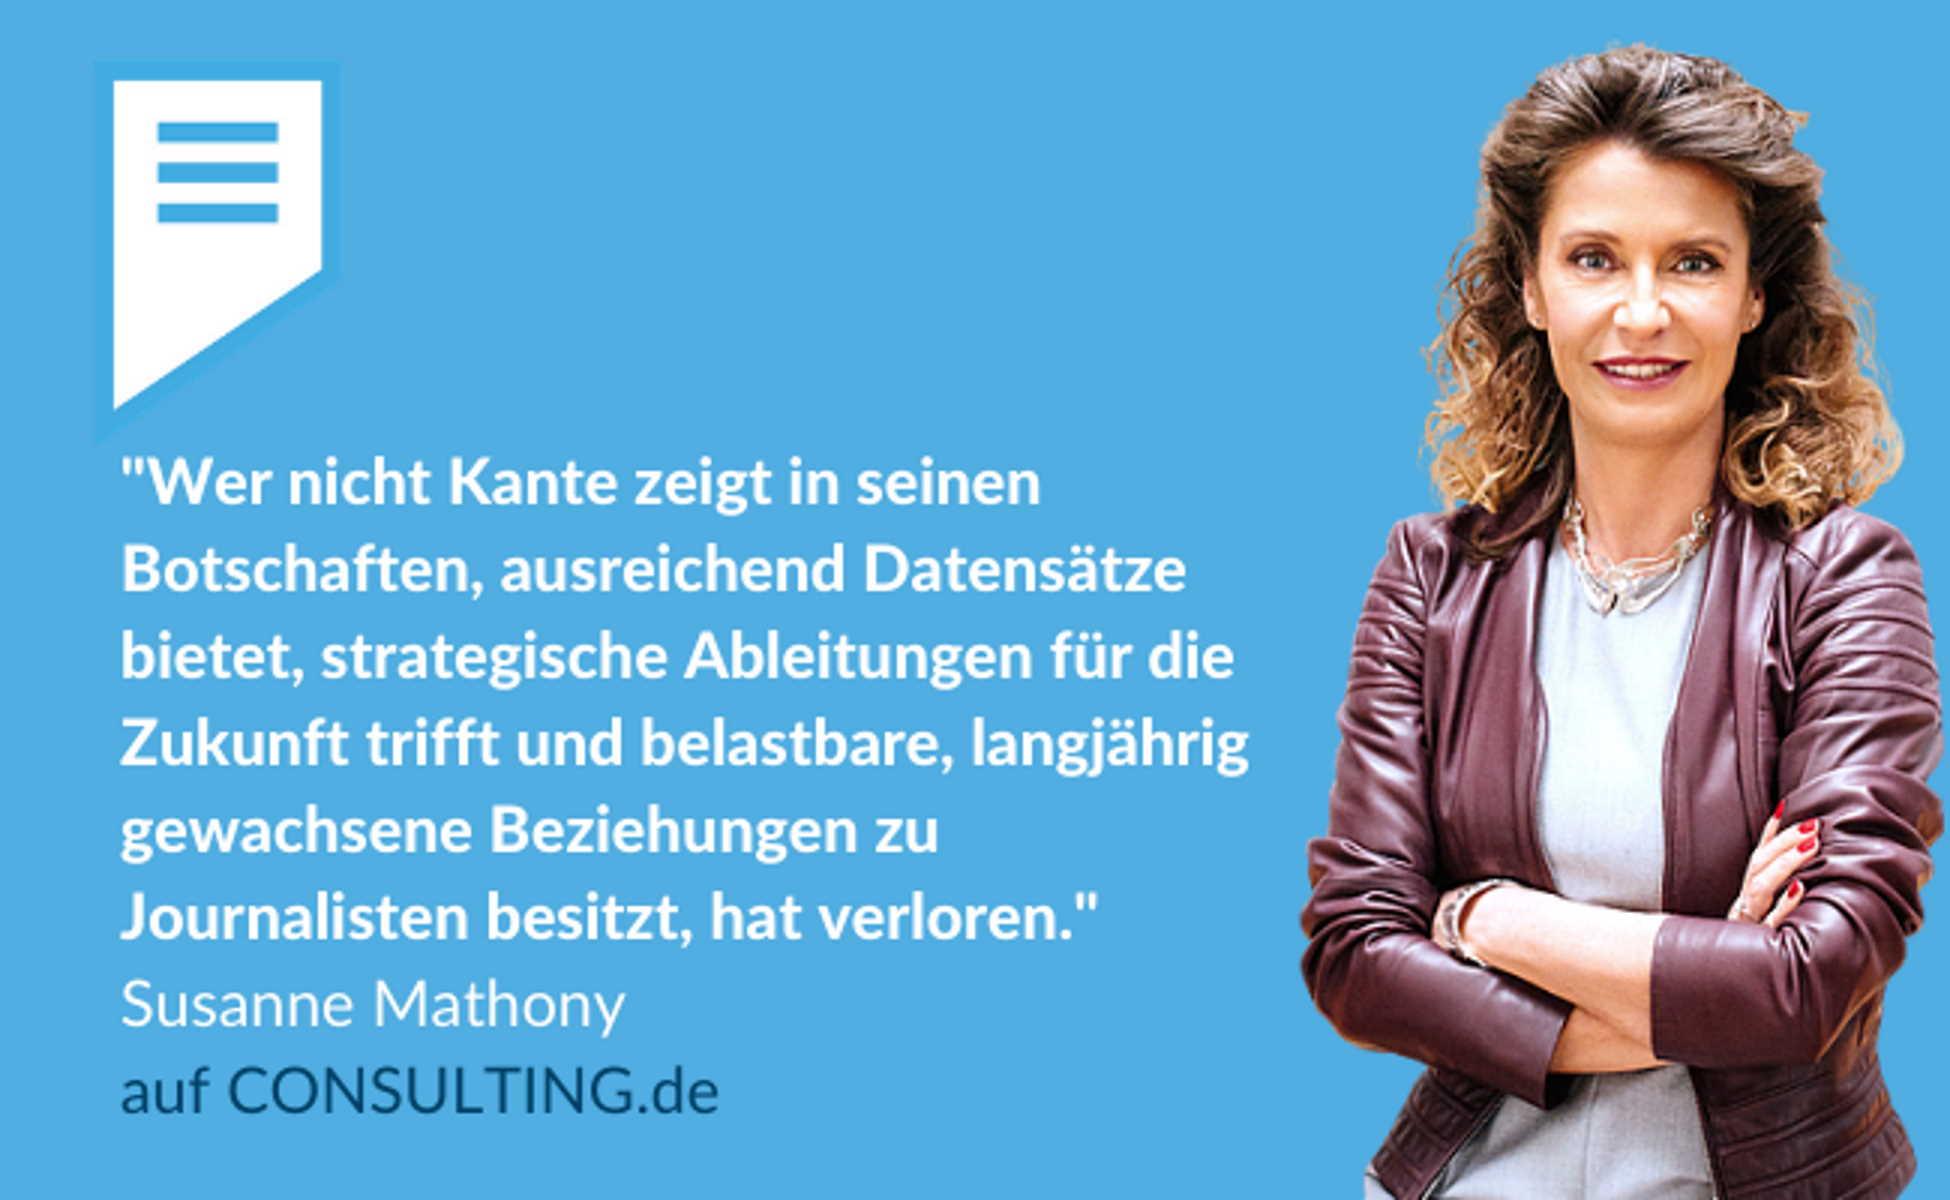 Susanne Mathony - Tought Leadership